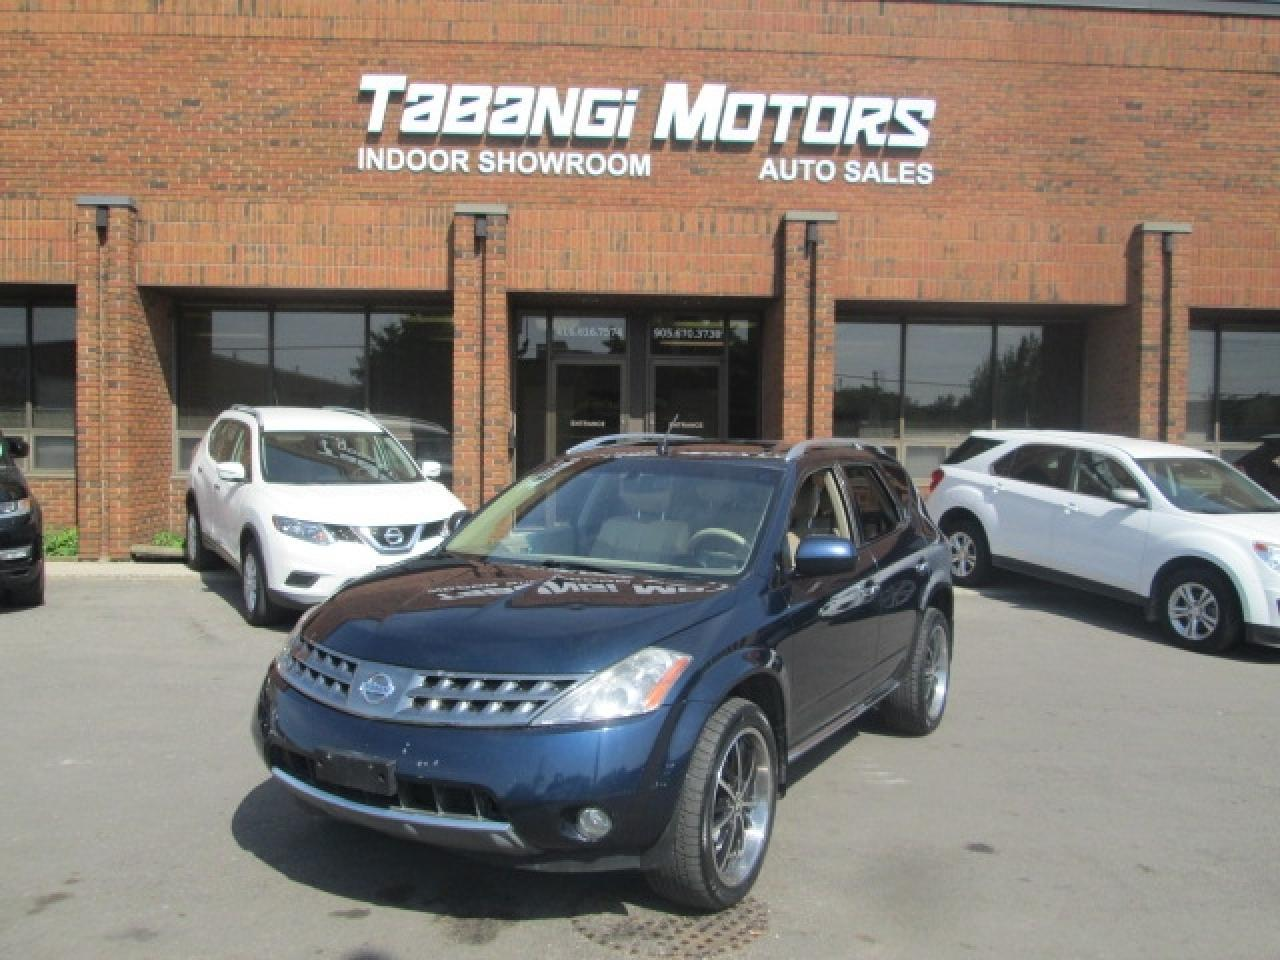 2007 Nissan Murano SL | AWD | LEATHER | SUNROOF | HEATED SEATS | BLUETOOTH